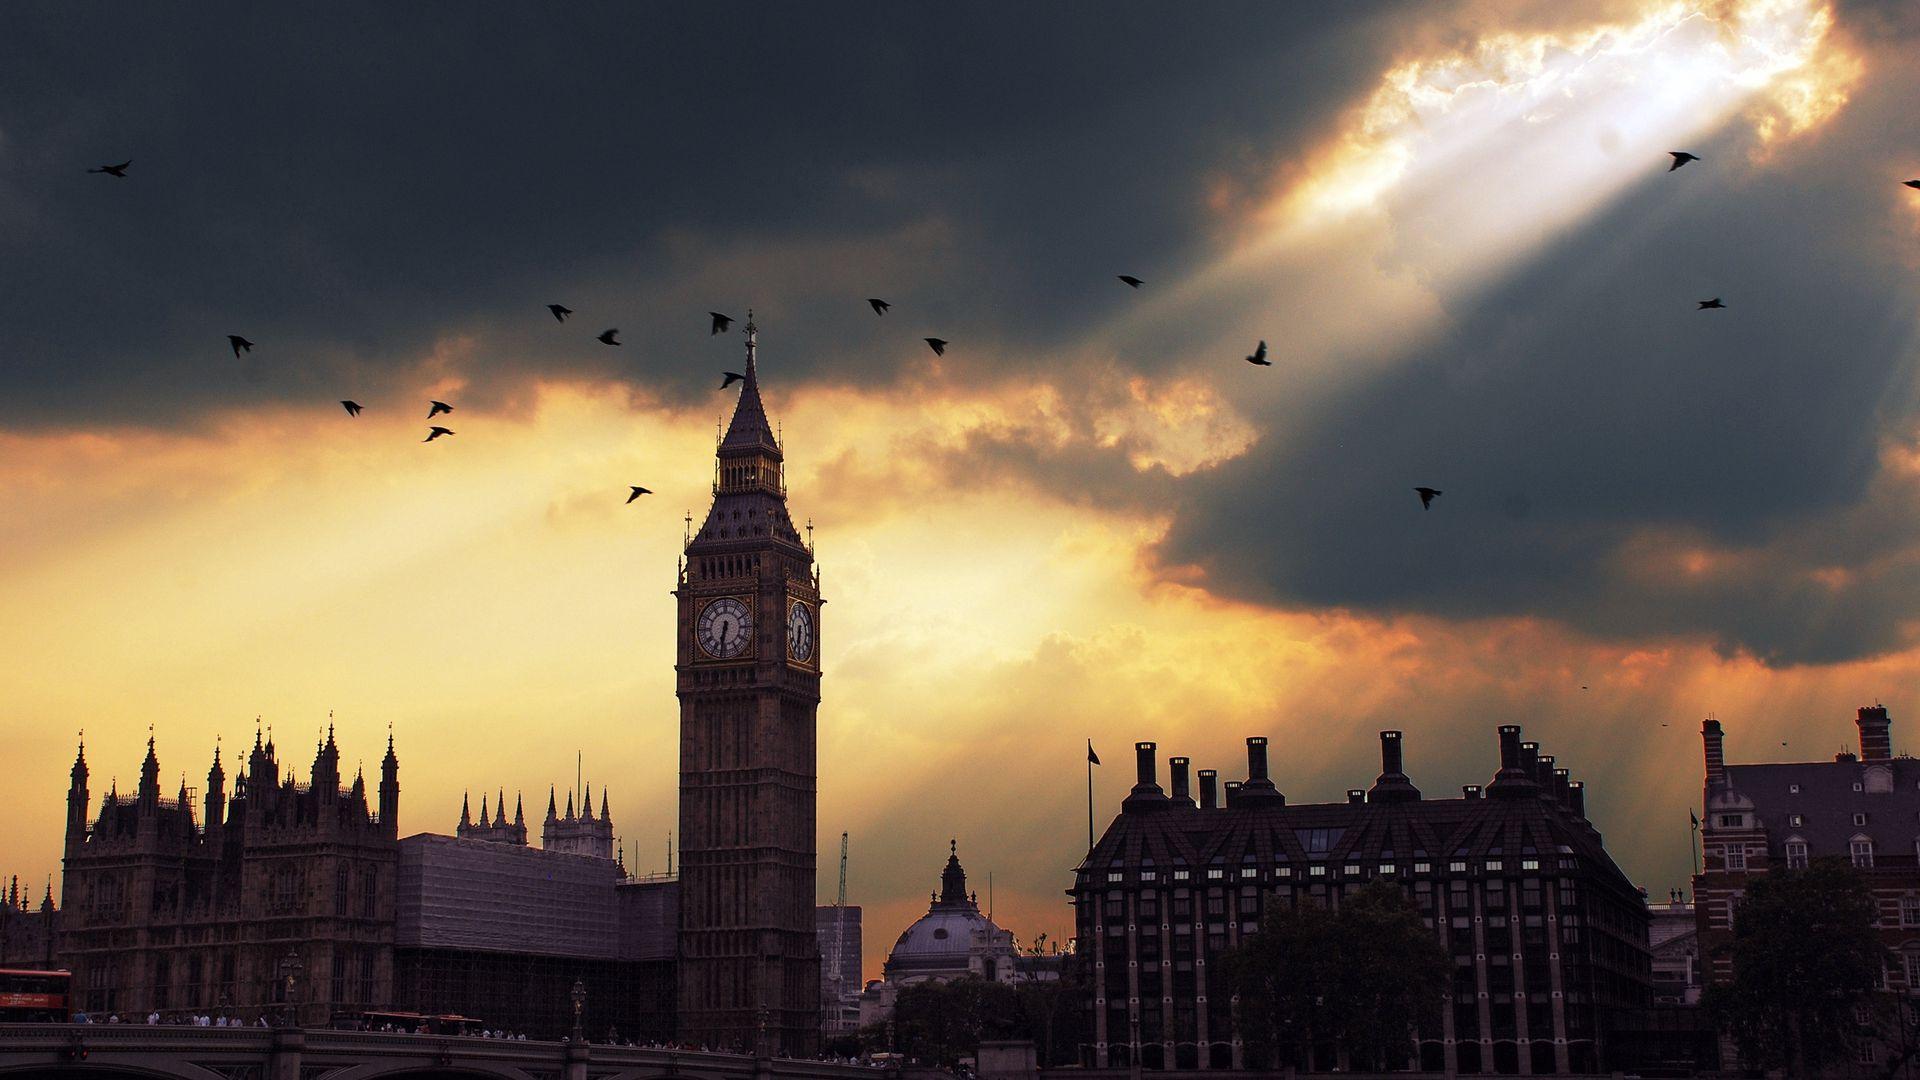 1920x1080 Wallpaper london, big ben, sunset, shadow, sky